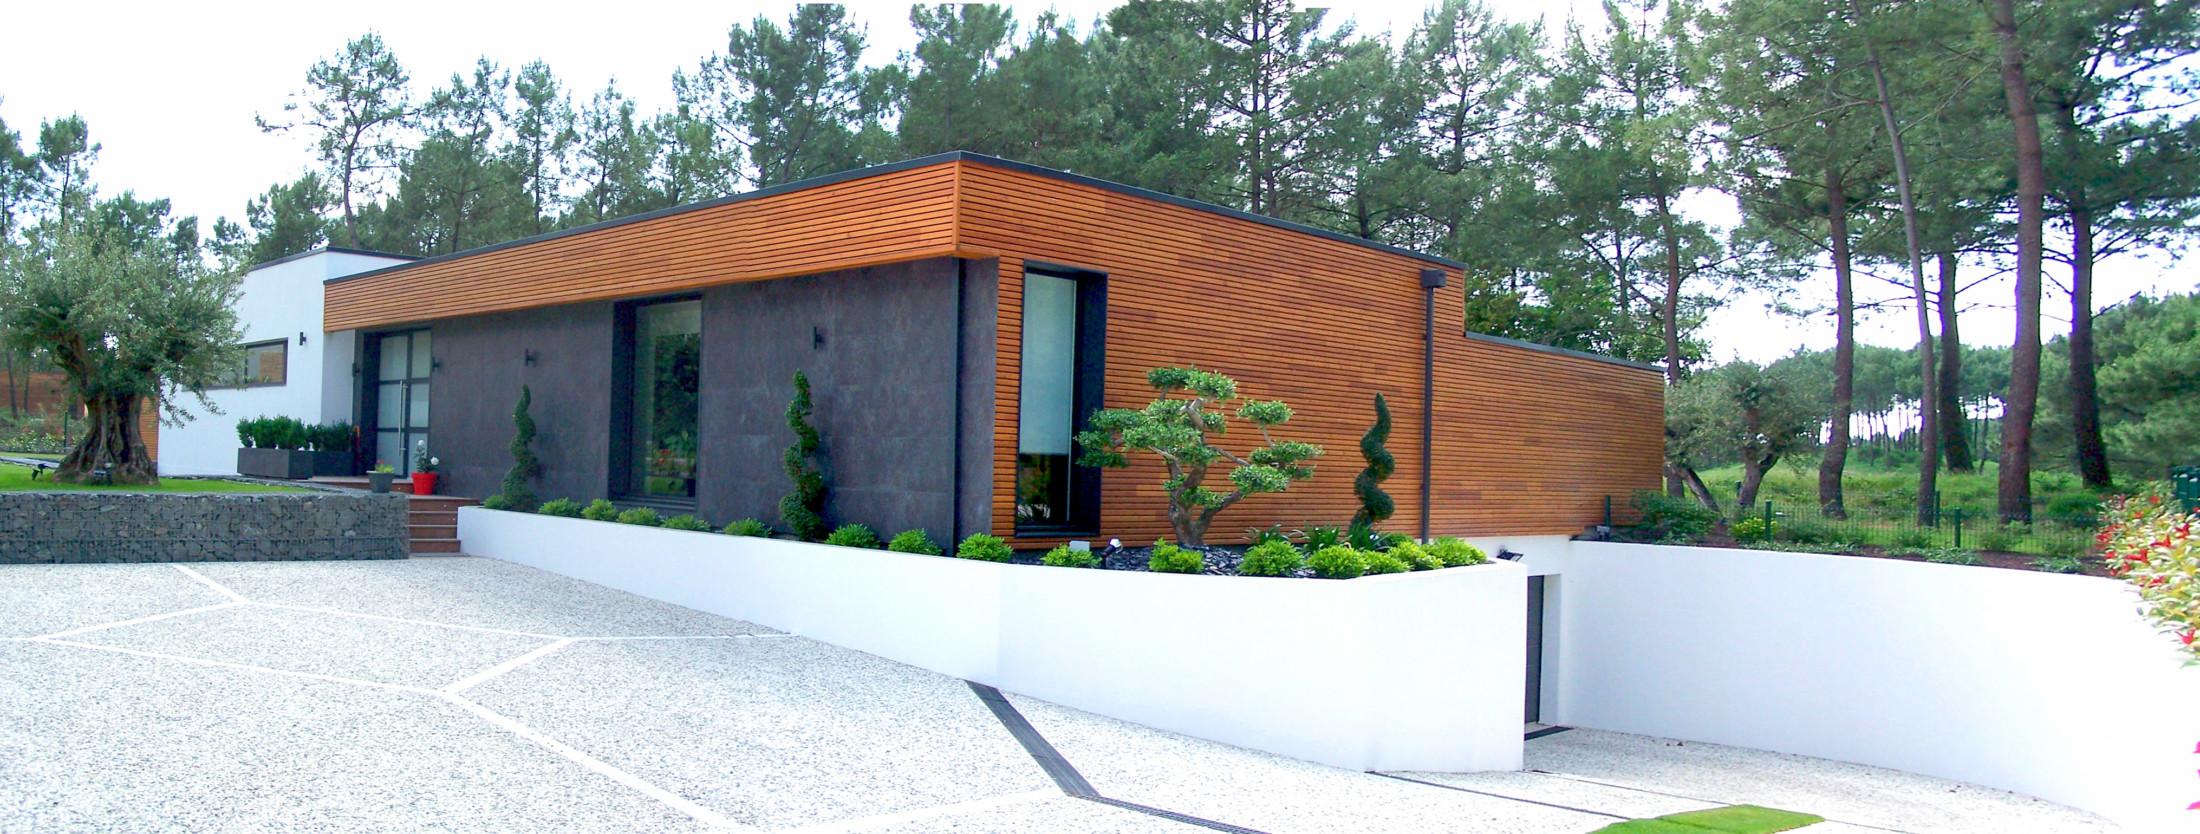 Villa-contemporain-entrée-paysager